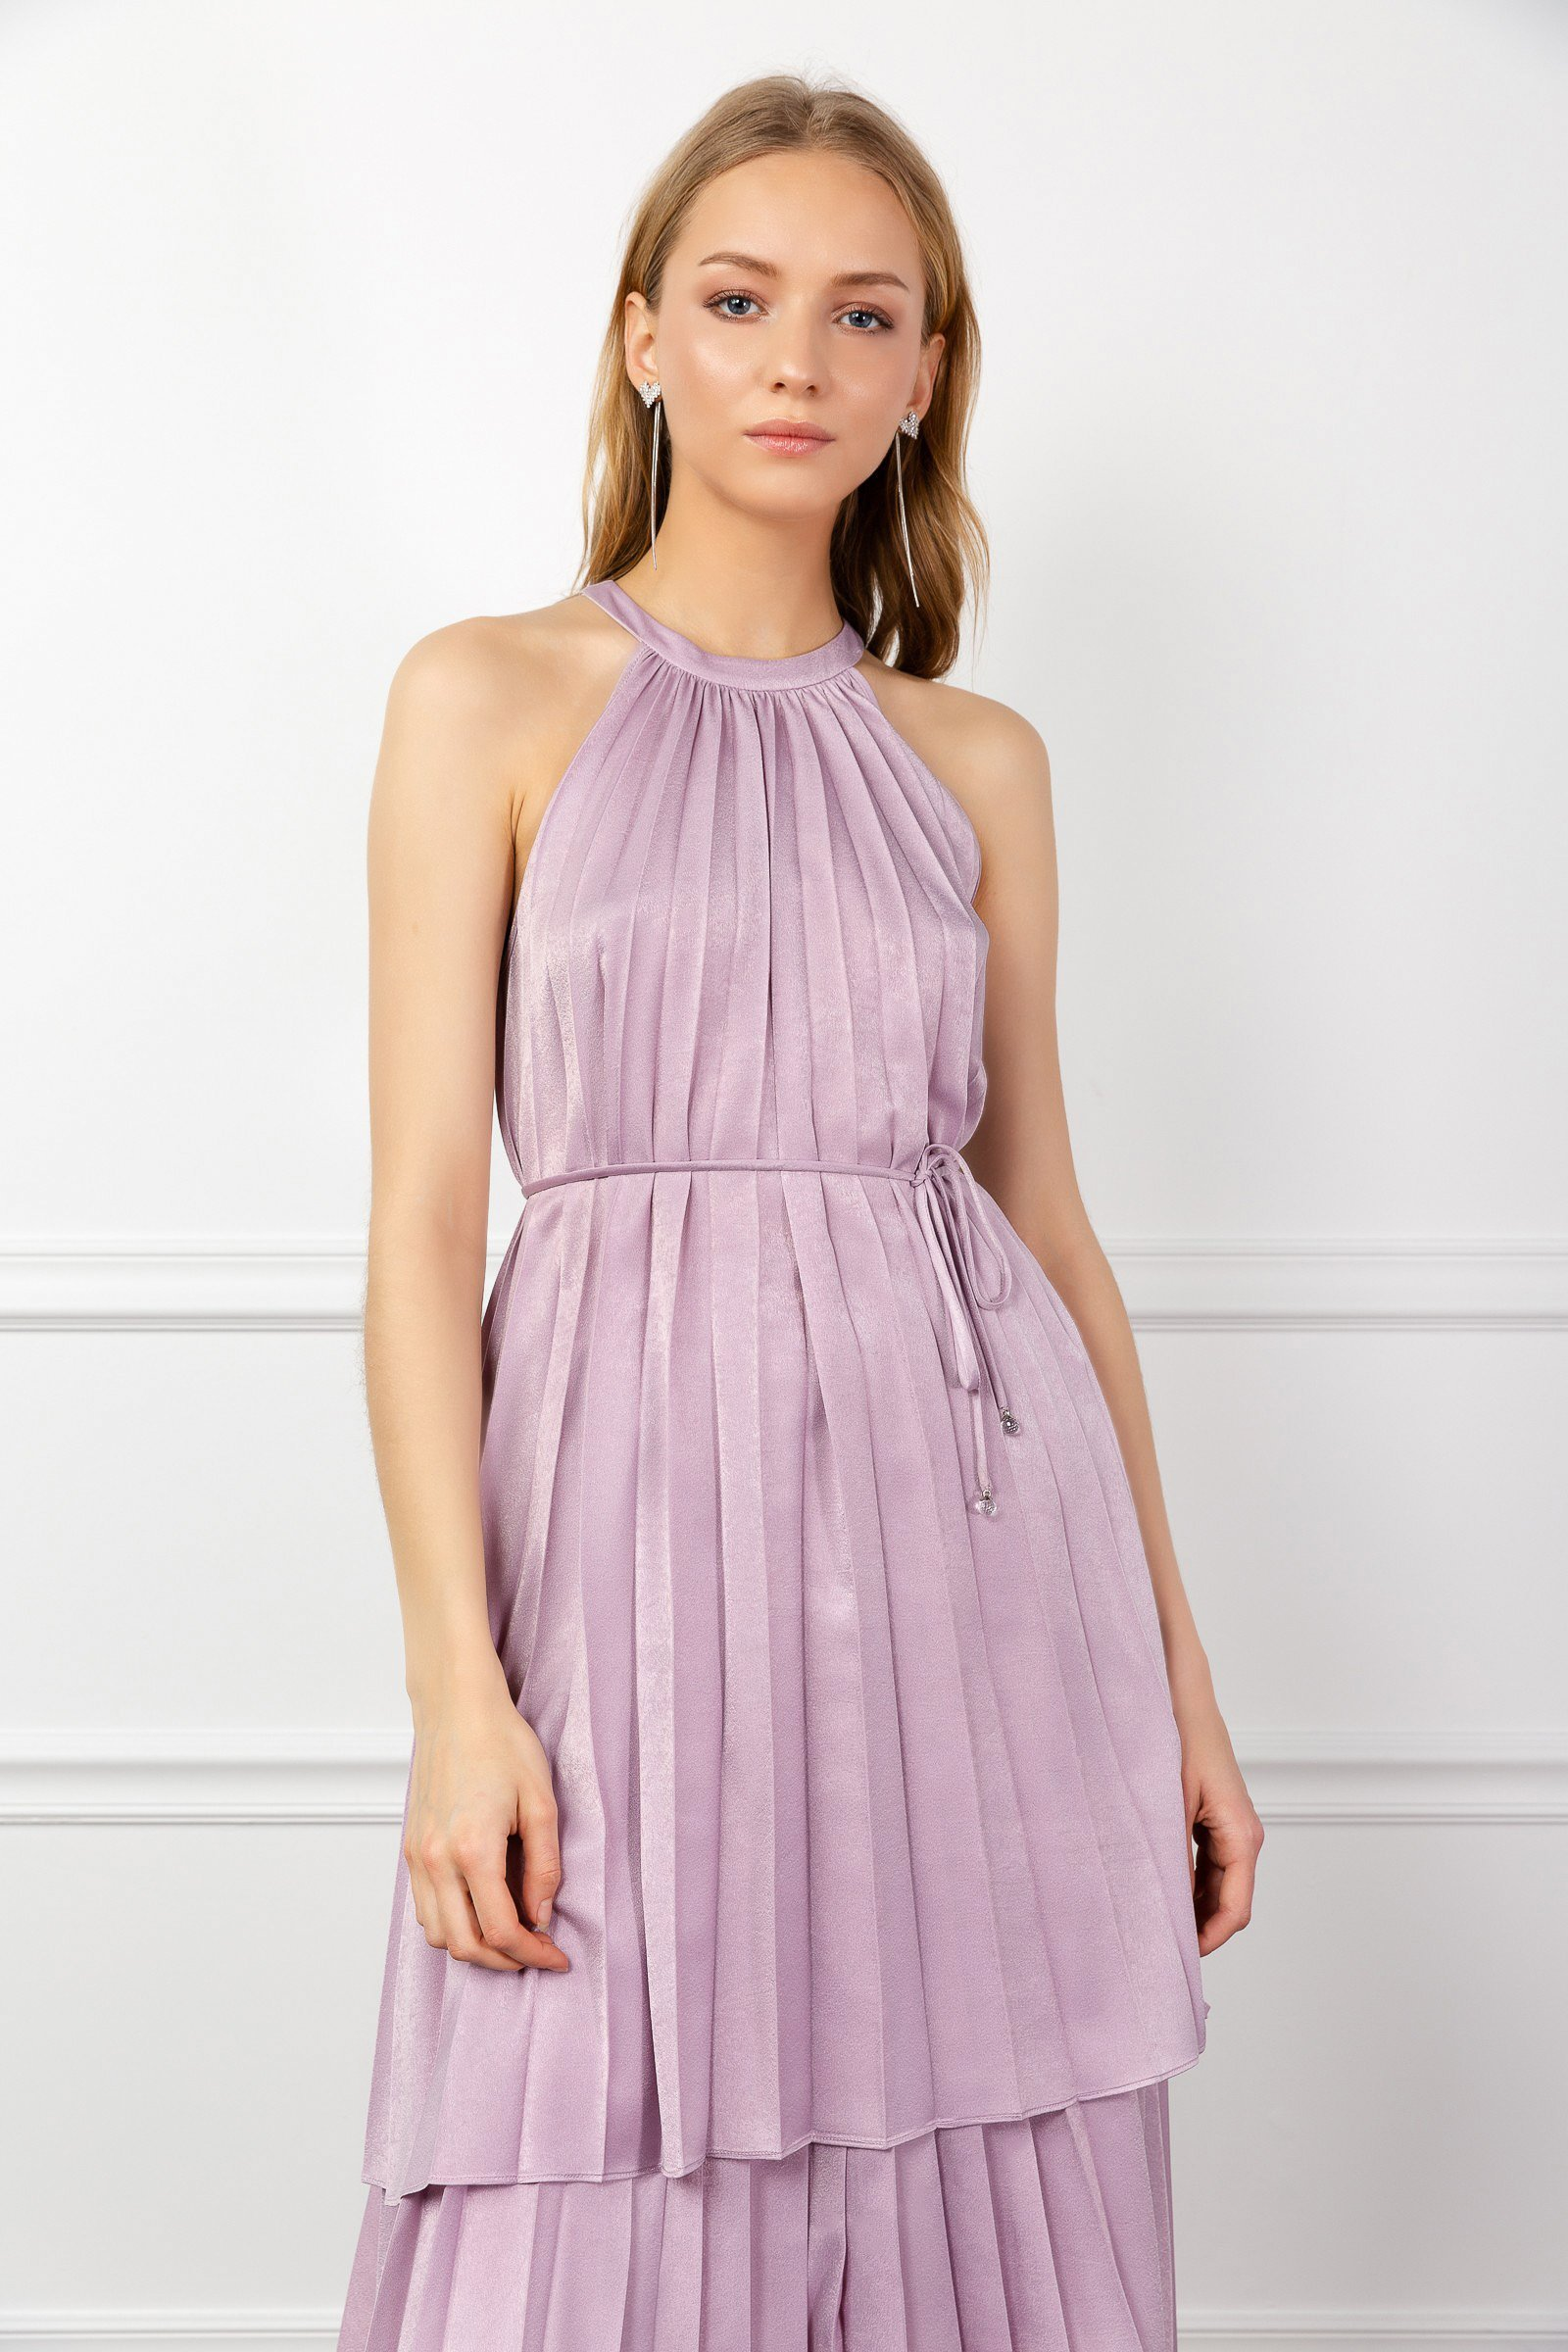 Image of Lavender Lola Top